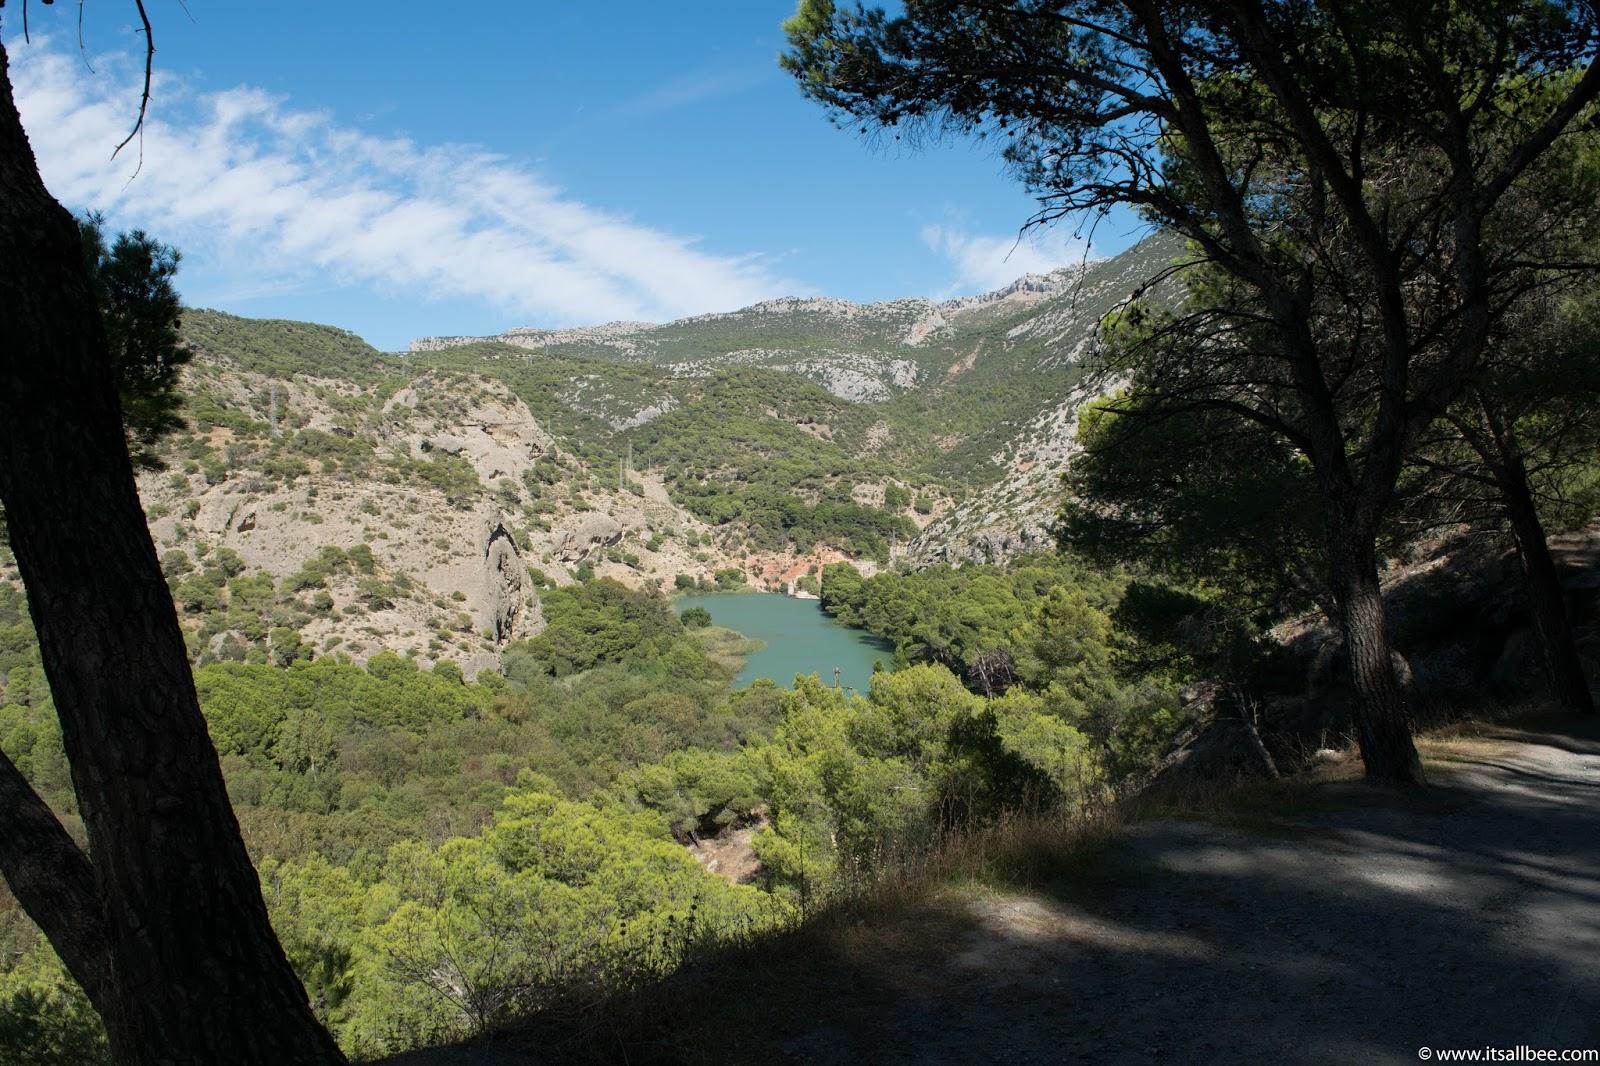 El Caminito Del Rey   Hiking Spain's Most Dangerous Hiking Trail